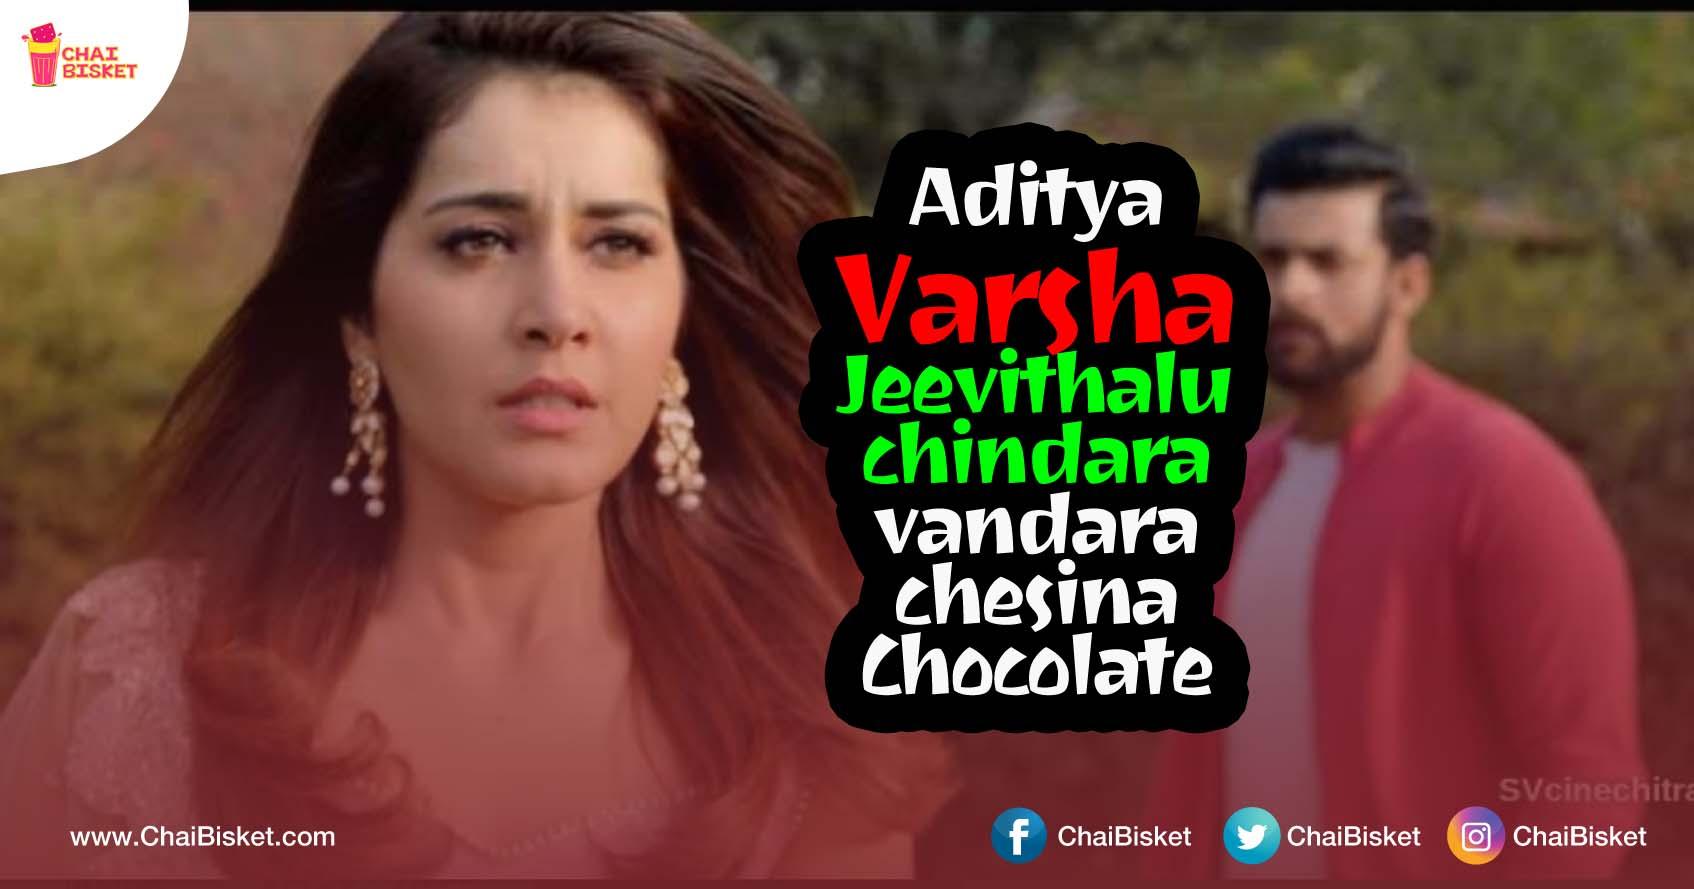 What If Scenes From Tholi Prema Movie Had Misleading Youtube